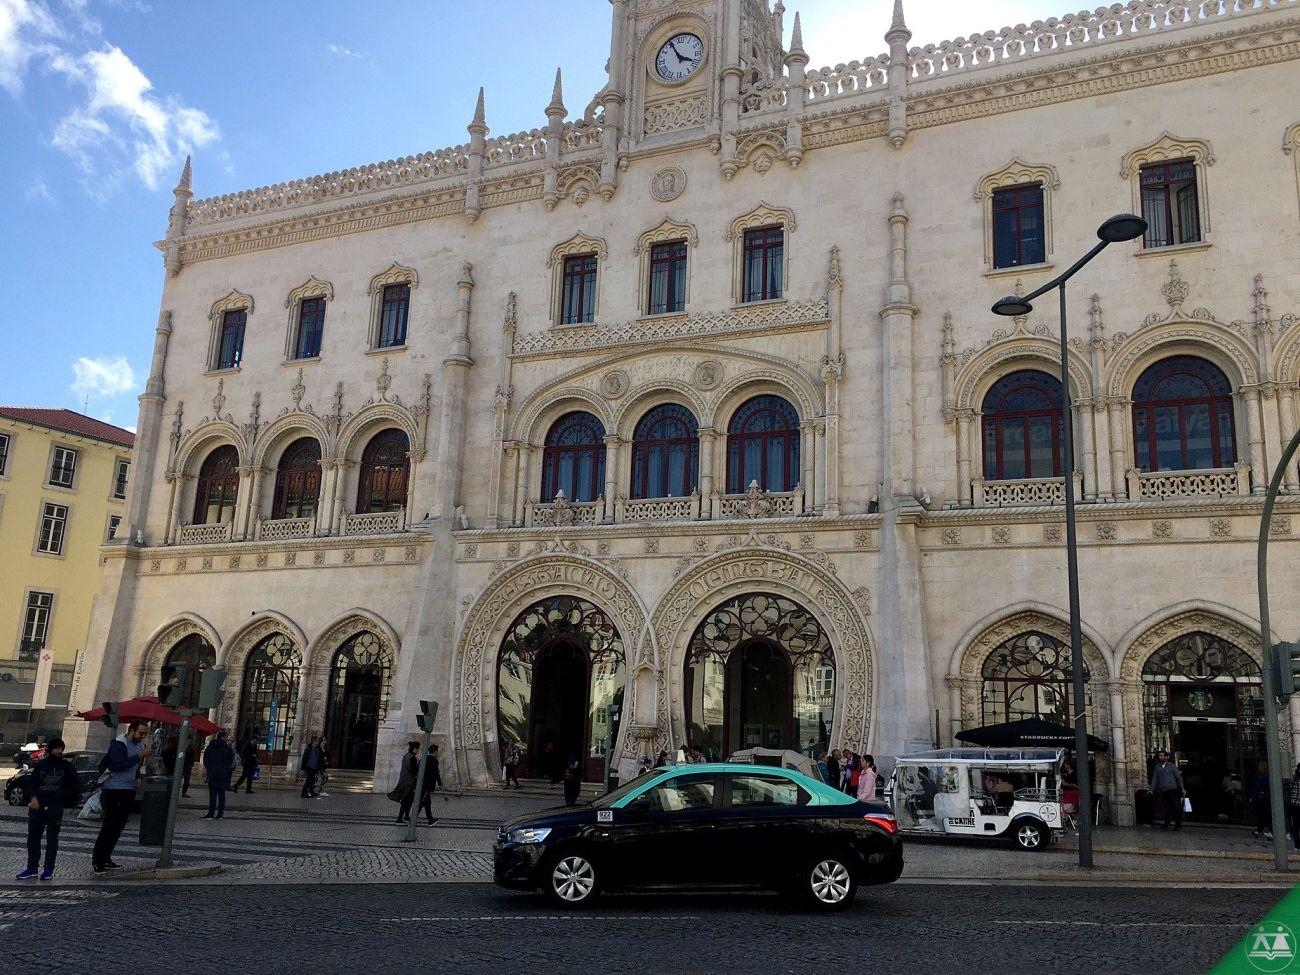 Erasmus-Braga-2019-Lizbona-Fatima-019